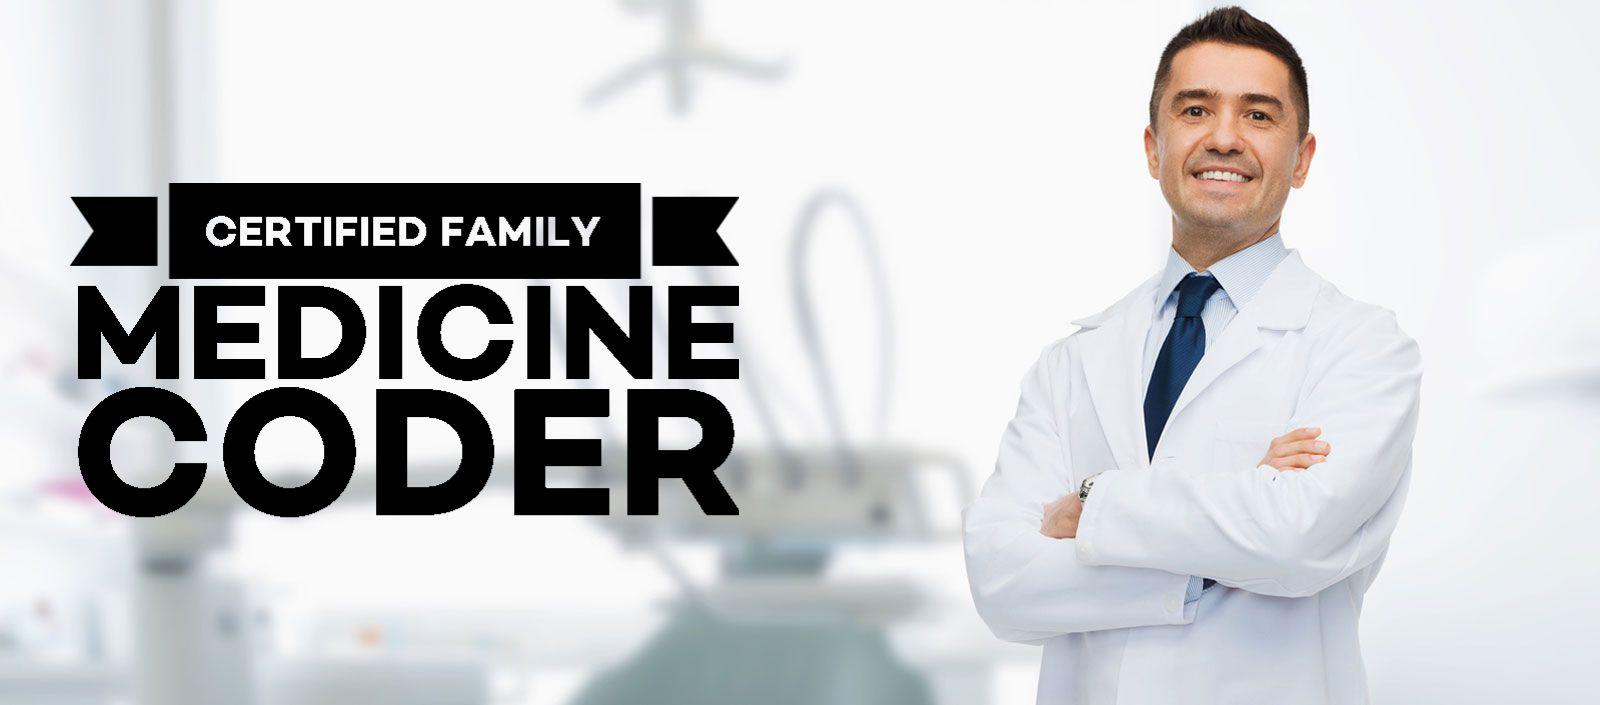 Certified Family Medicine Coder training in hyderabad (CFPC)